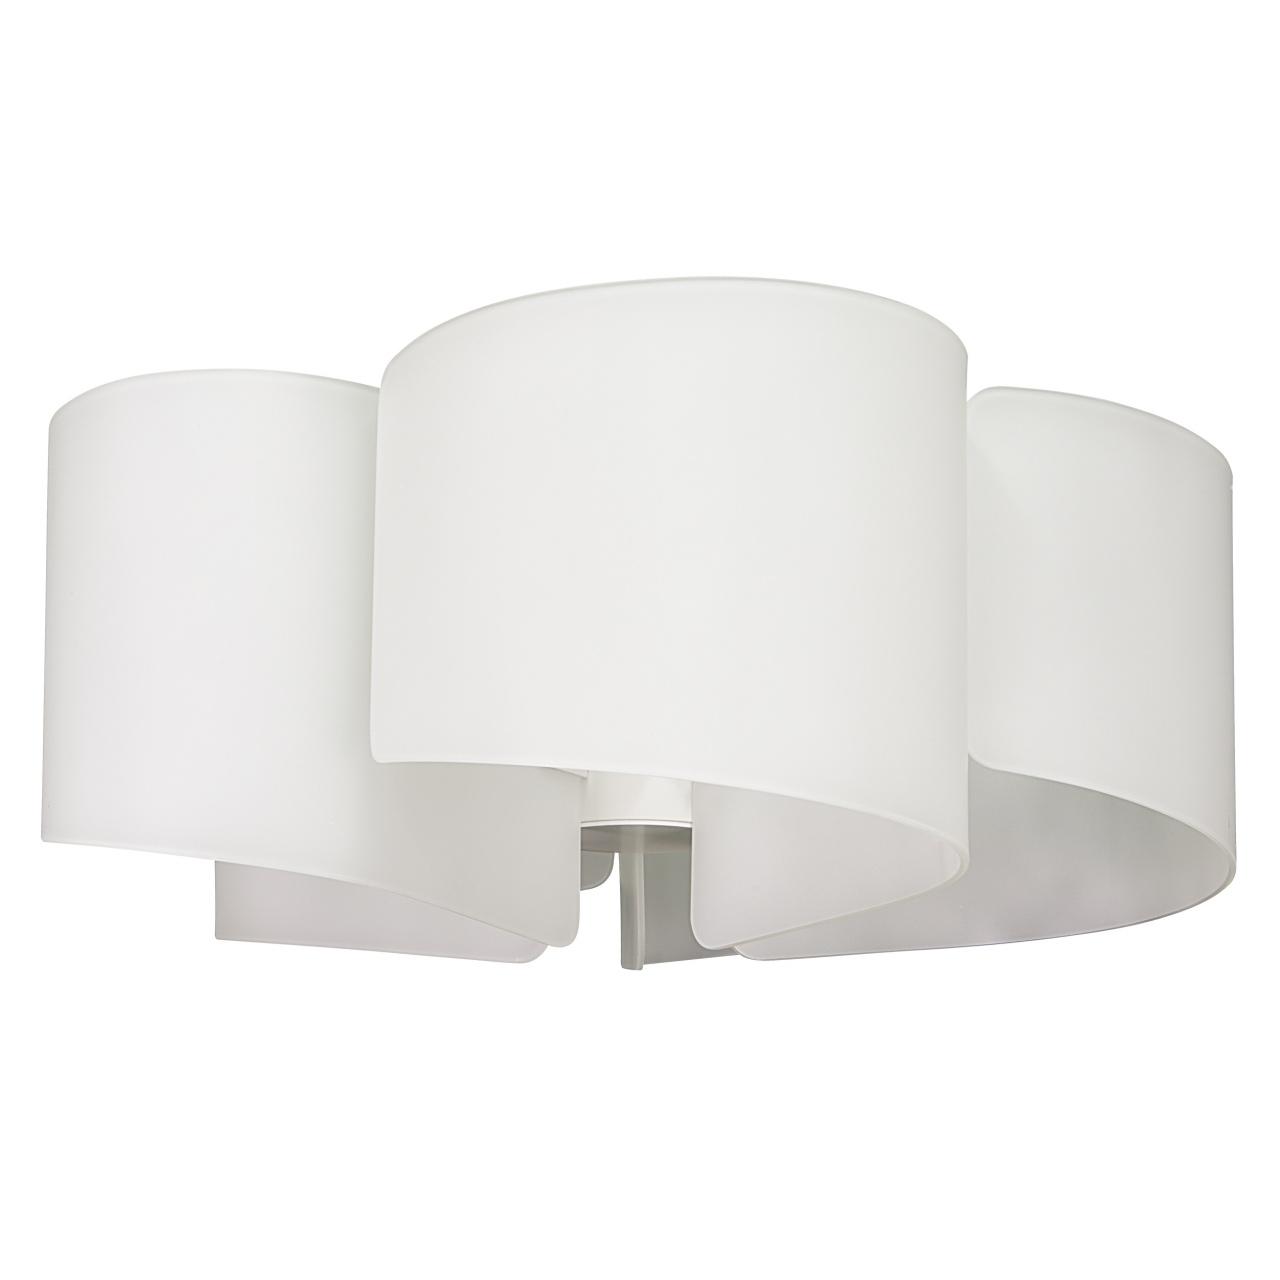 Люстра потолочная Pittore 5х40W E27 белый Lightstar 811050